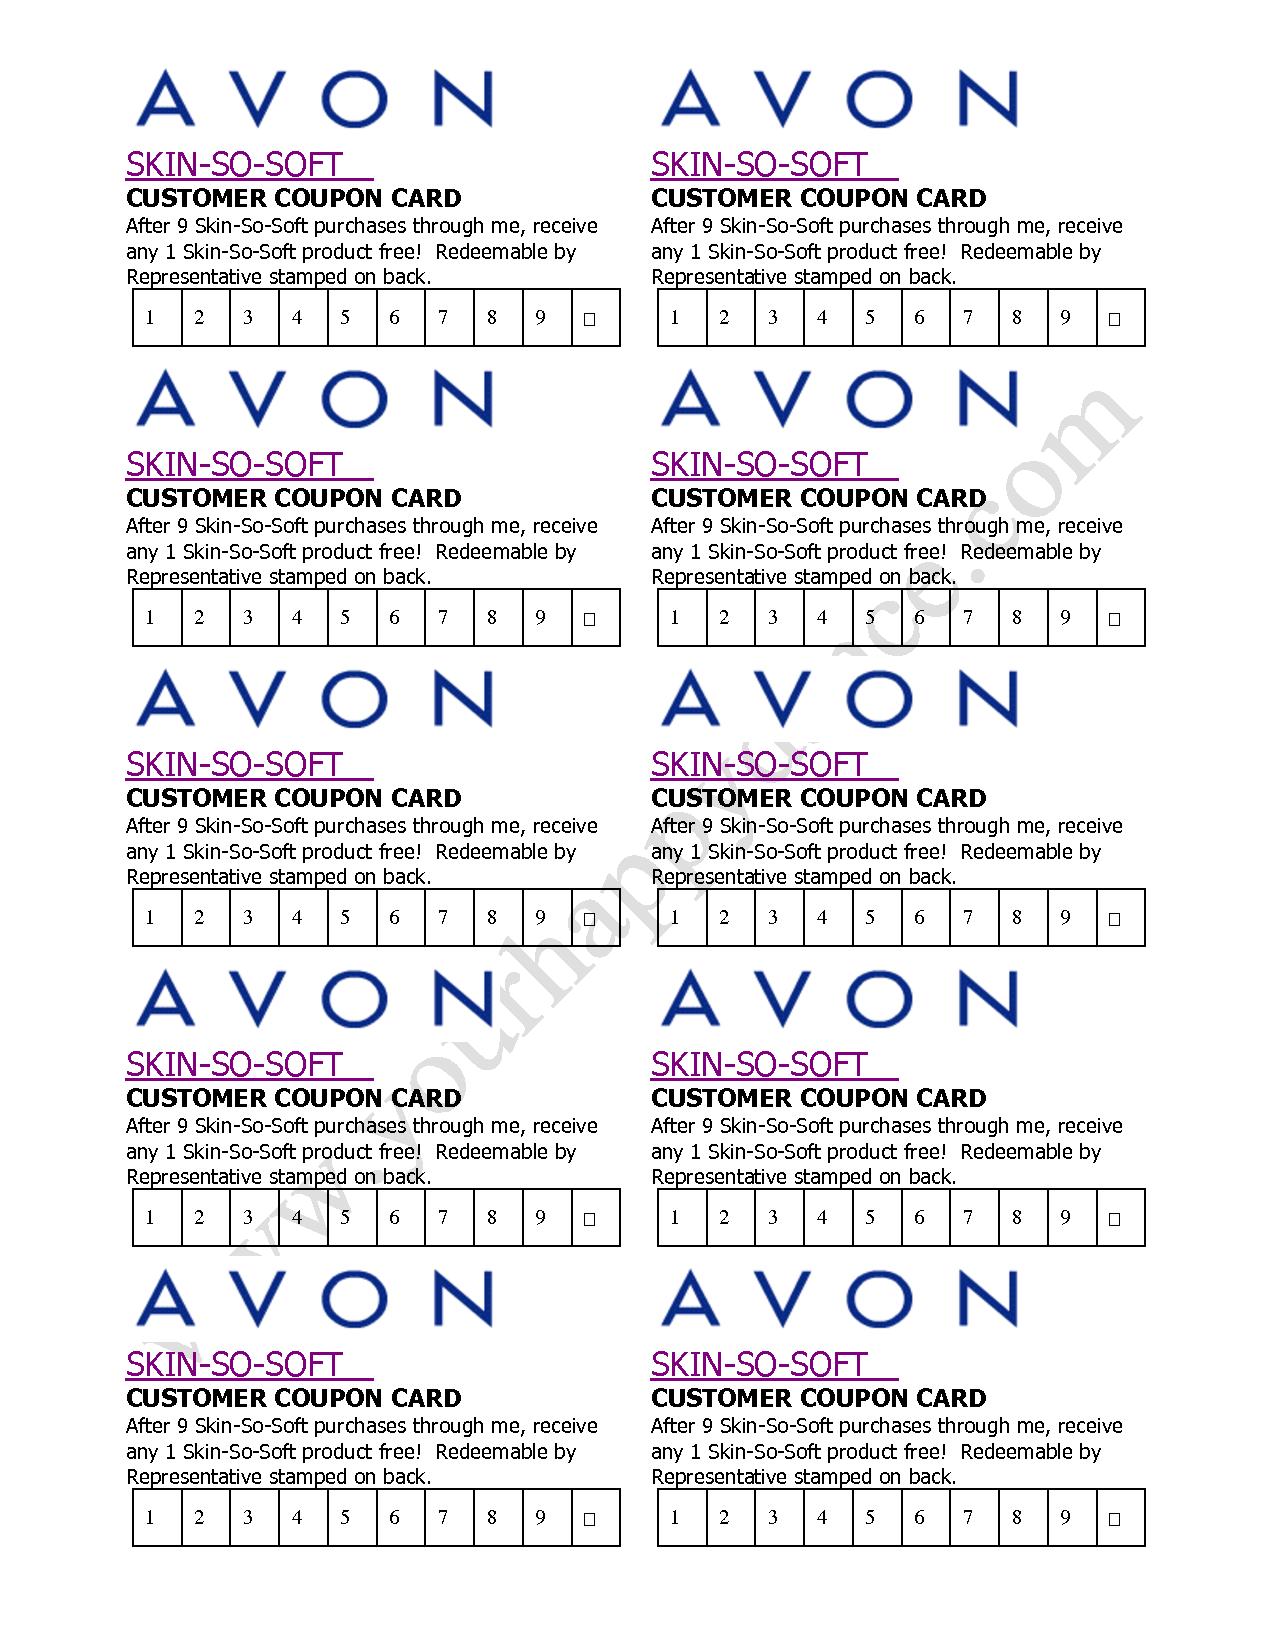 Avon coupon code september 2018